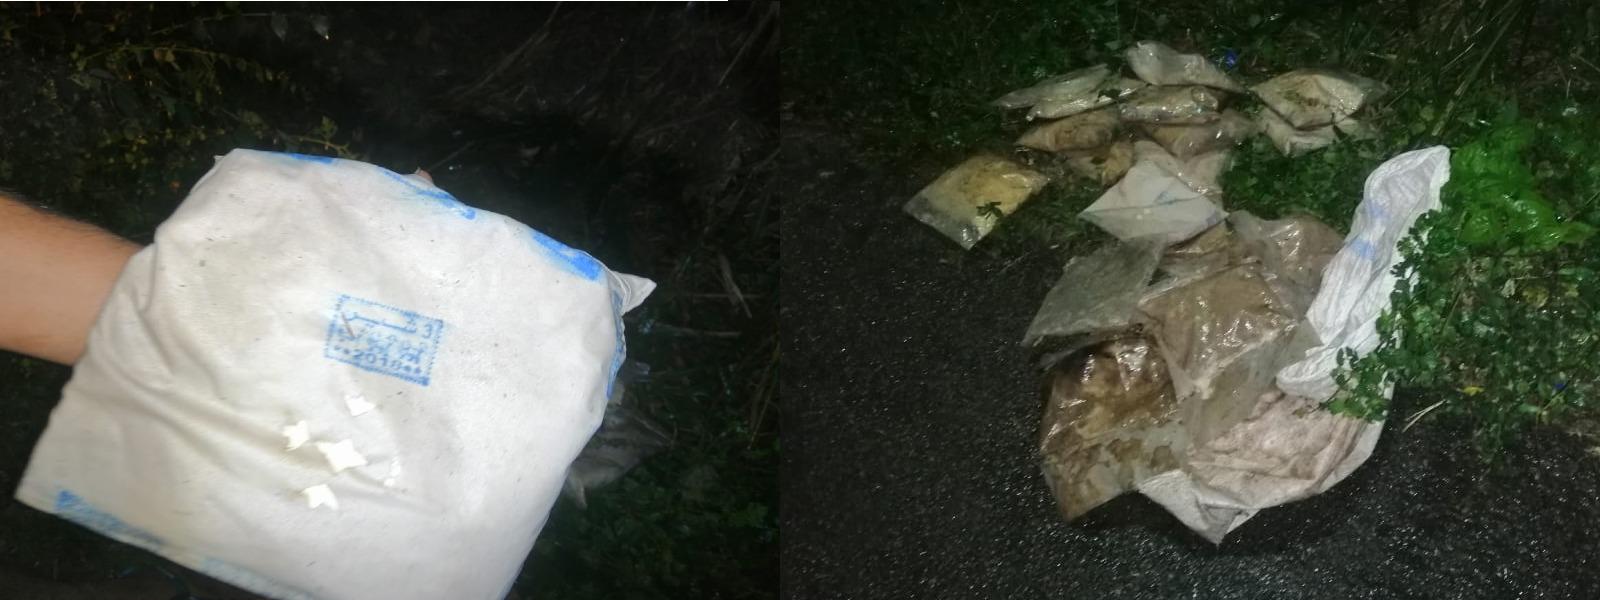 20 KG OF HEROIN SEIZED IN KOSGODA